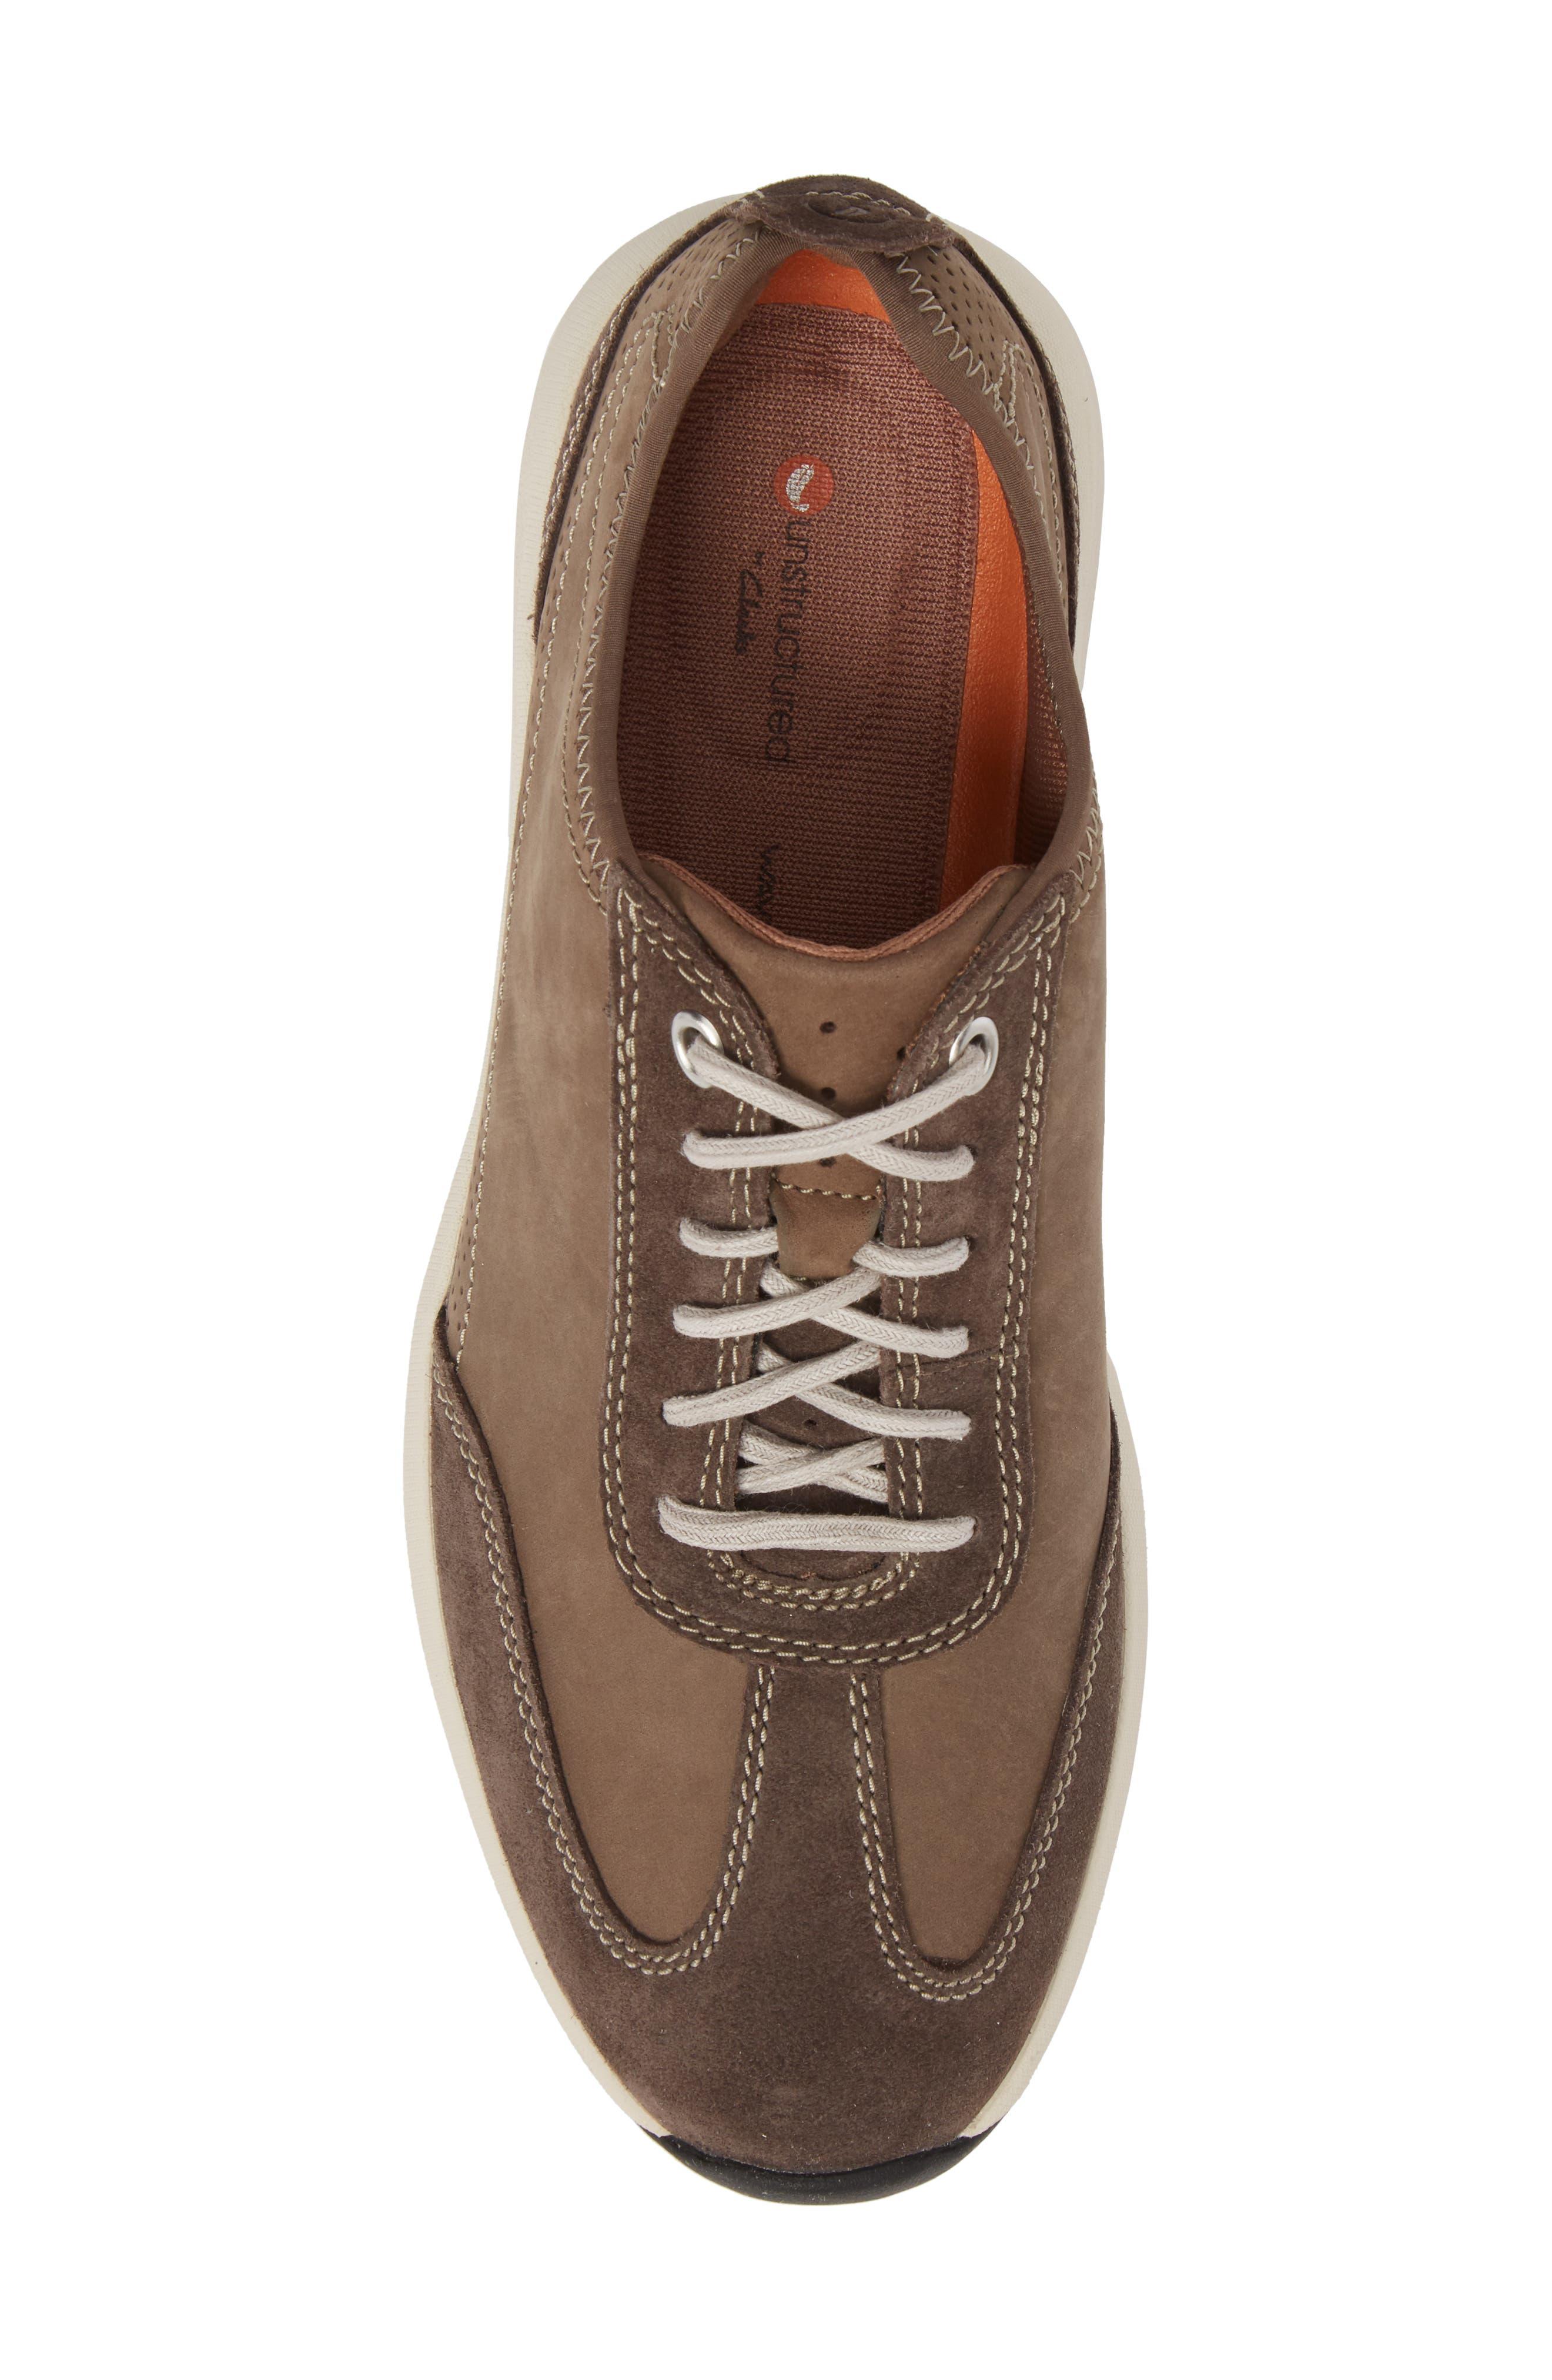 Clarks<sup>®</sup> Un Coast Low Top Sneaker,                             Alternate thumbnail 5, color,                             Taupe Nubuck